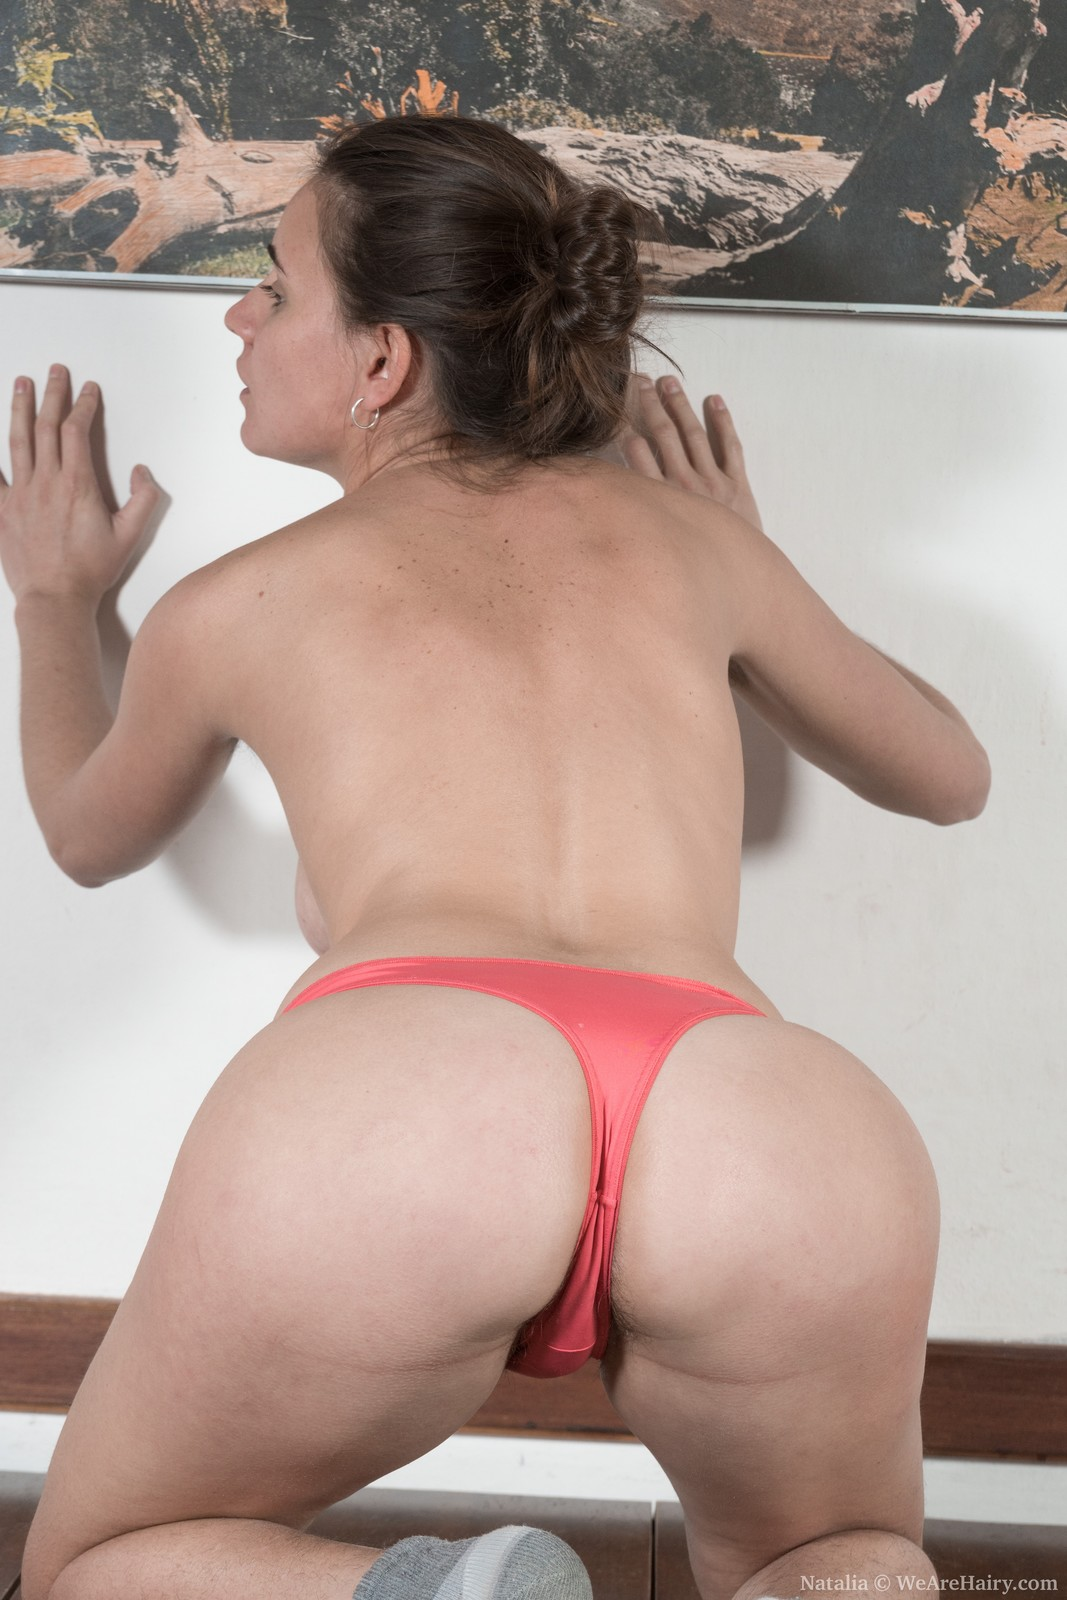 Natalia_PurpleTopRedLingerie_052